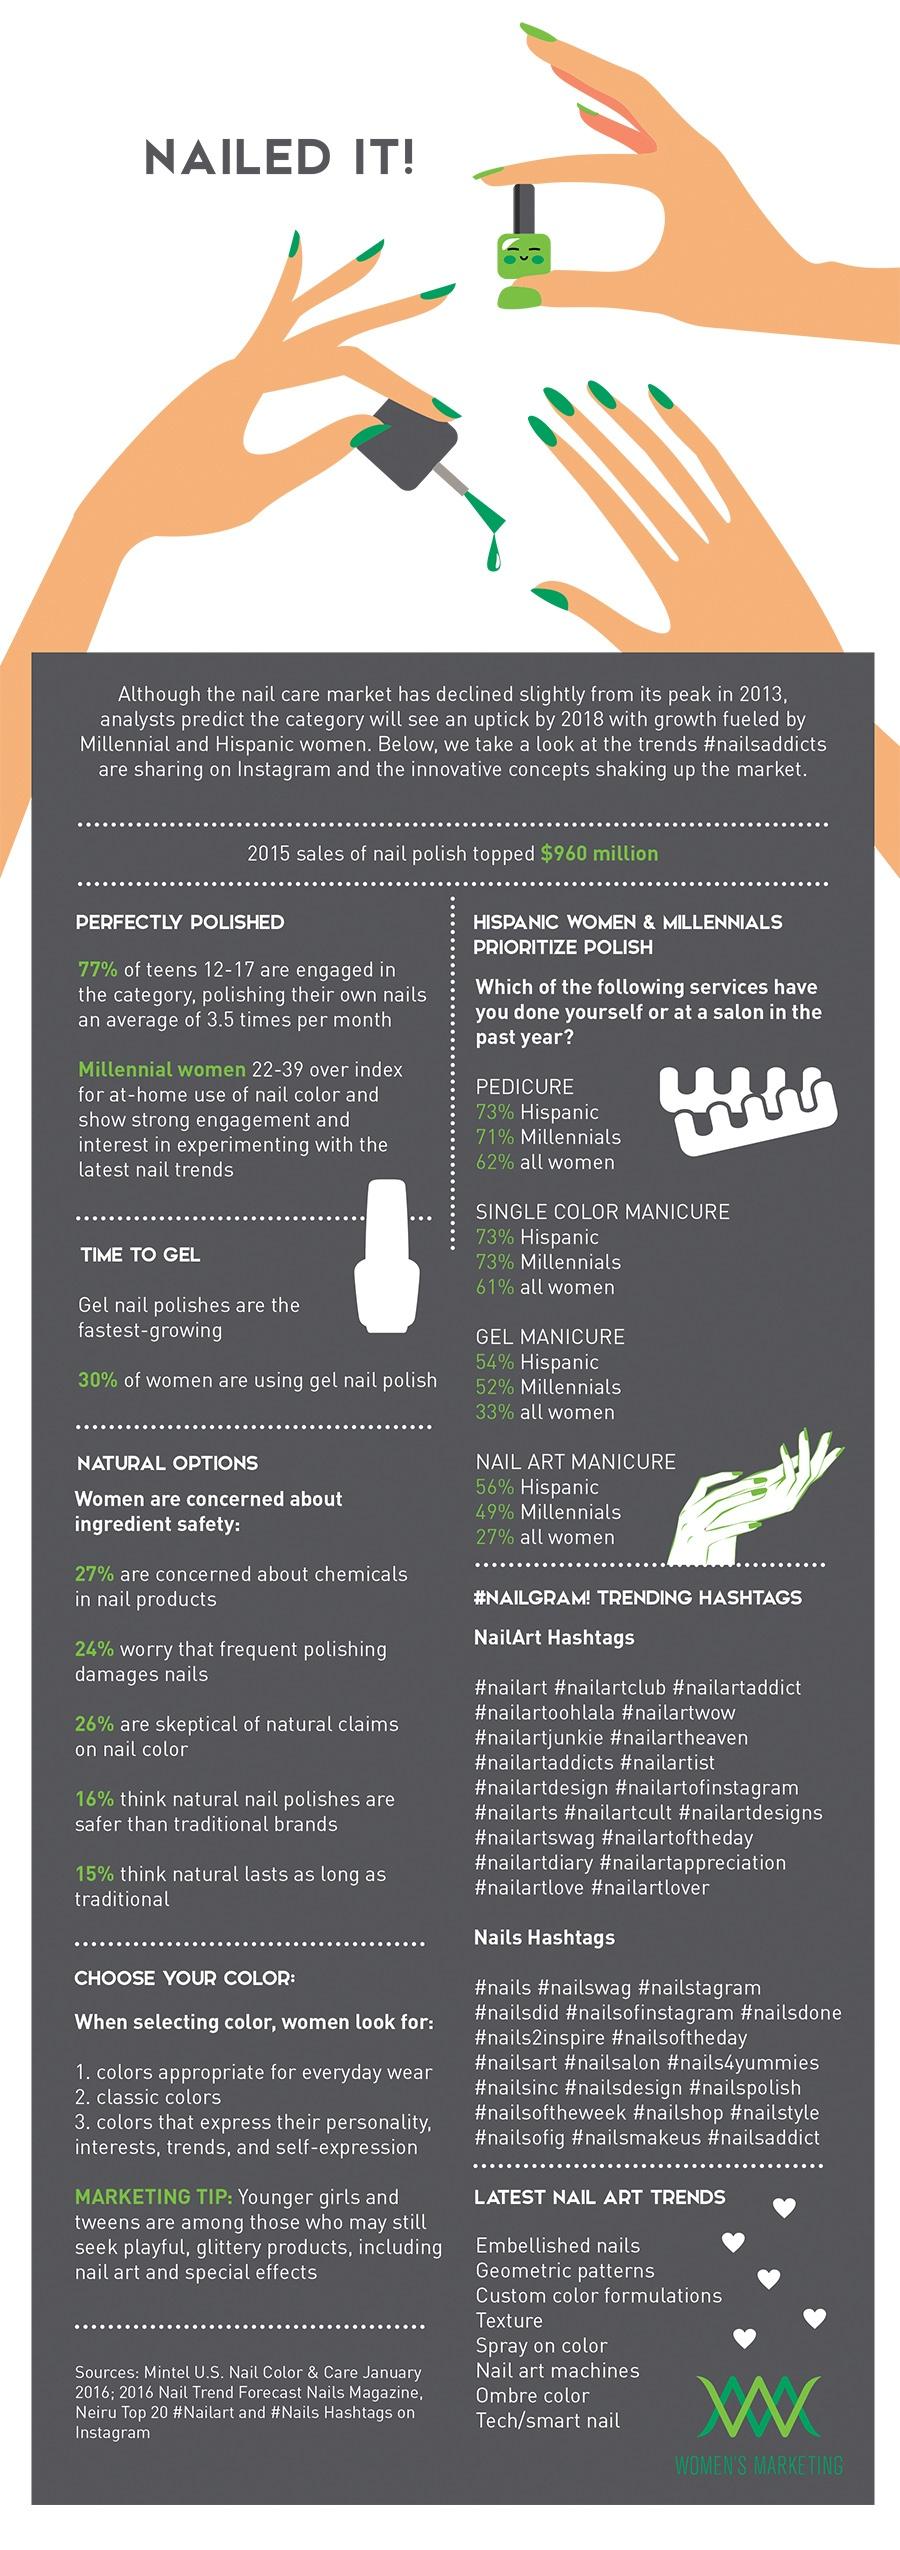 NailedIt_Infographic.jpg